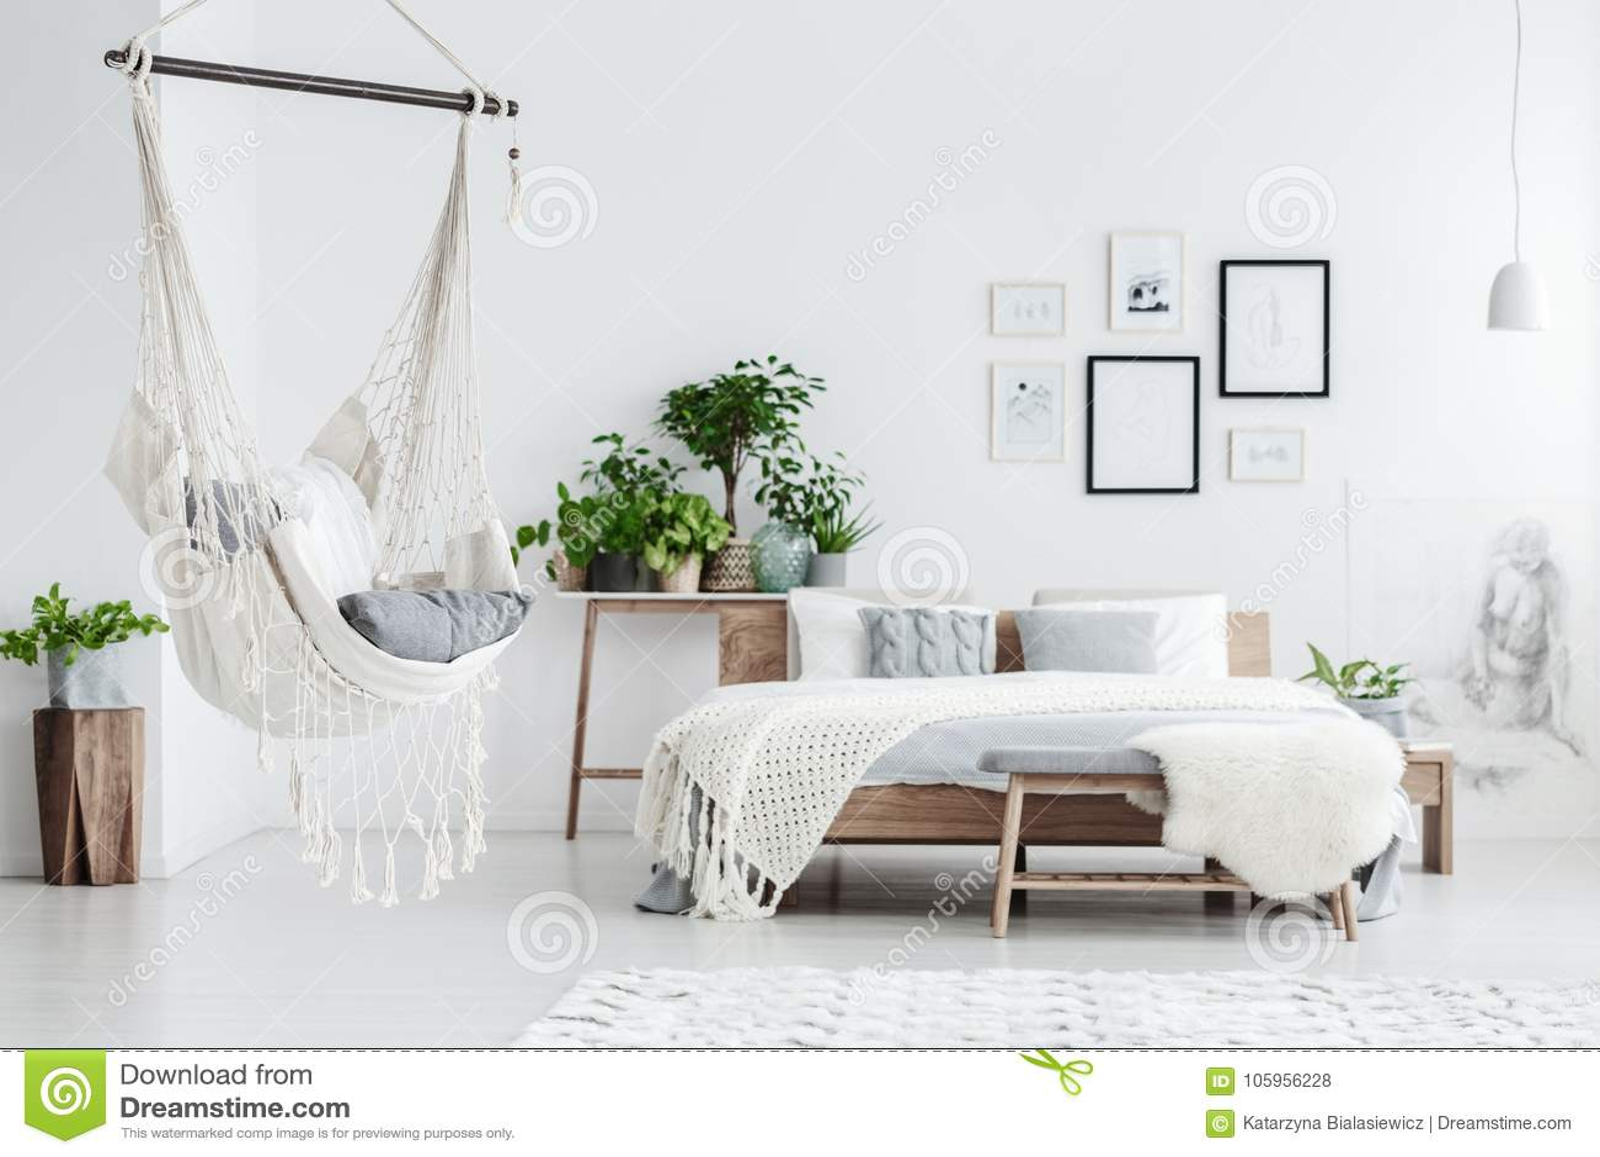 Hammock hanging in bedroom stock photo. Image of chair - 105956228